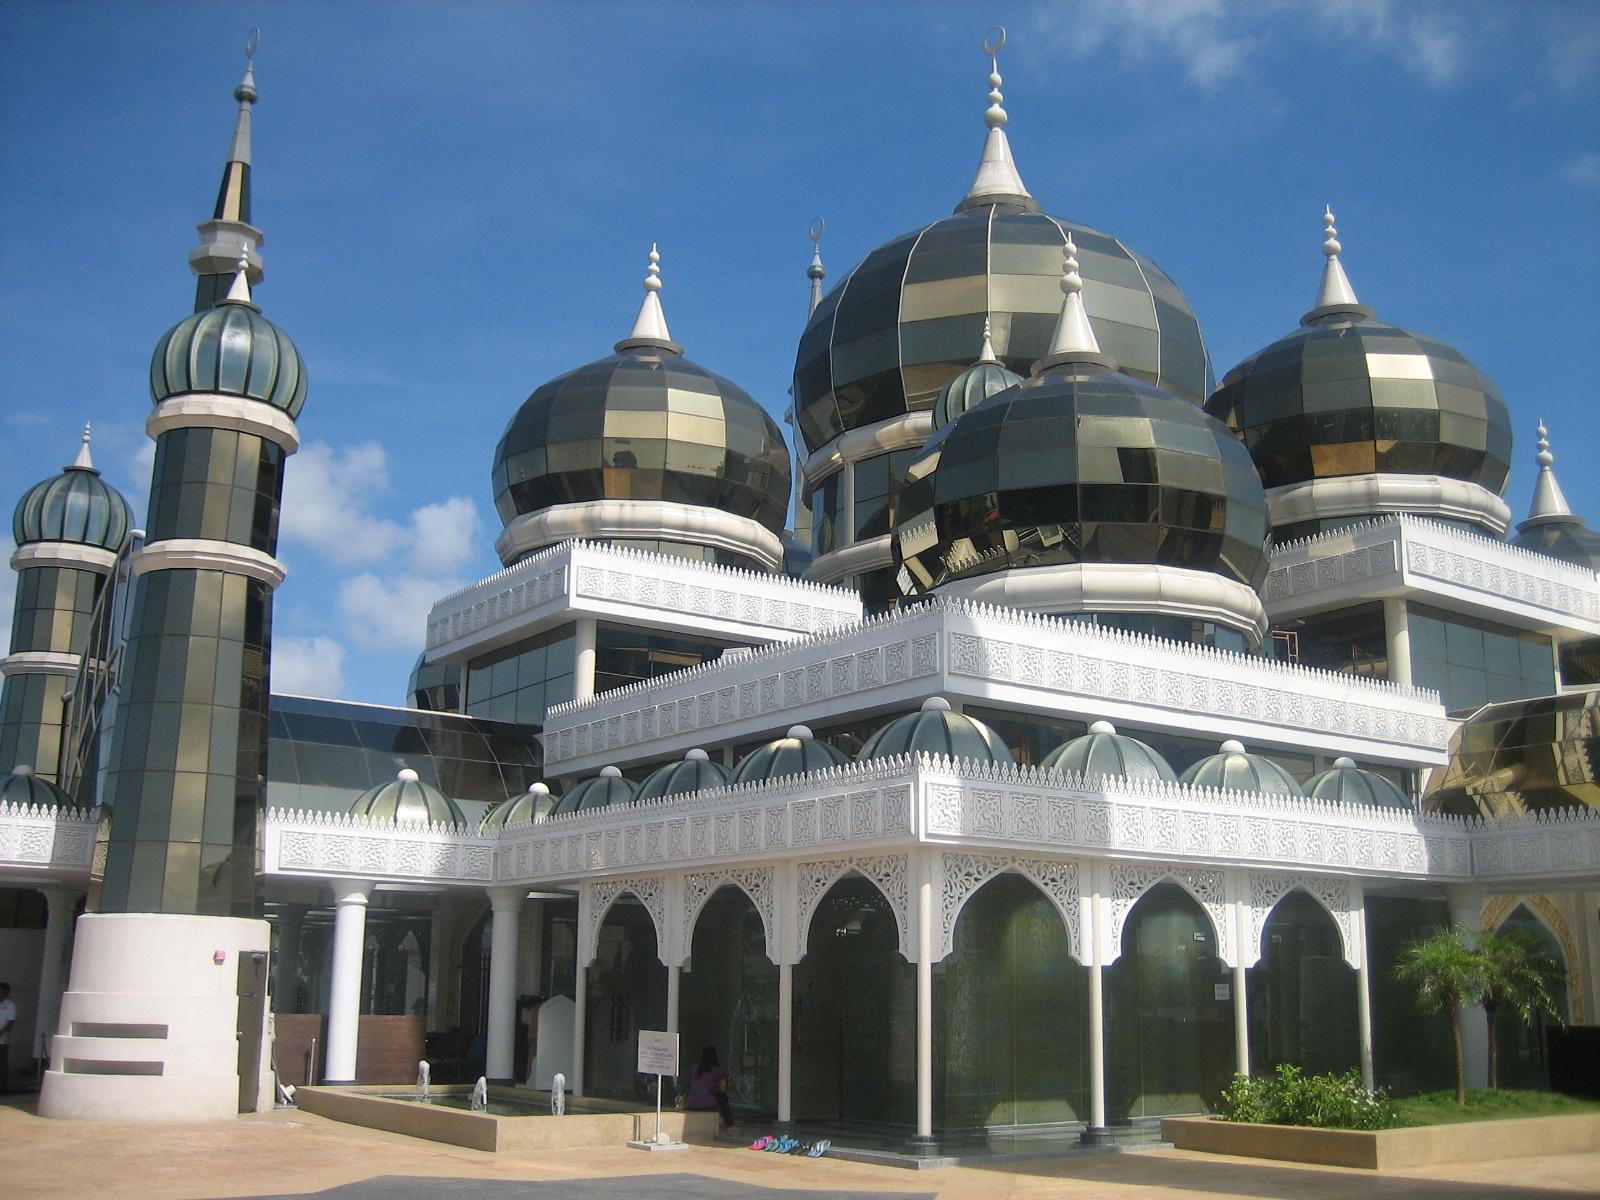 Paragliding Wallpaper Hd Cool Images Masjid Kristal